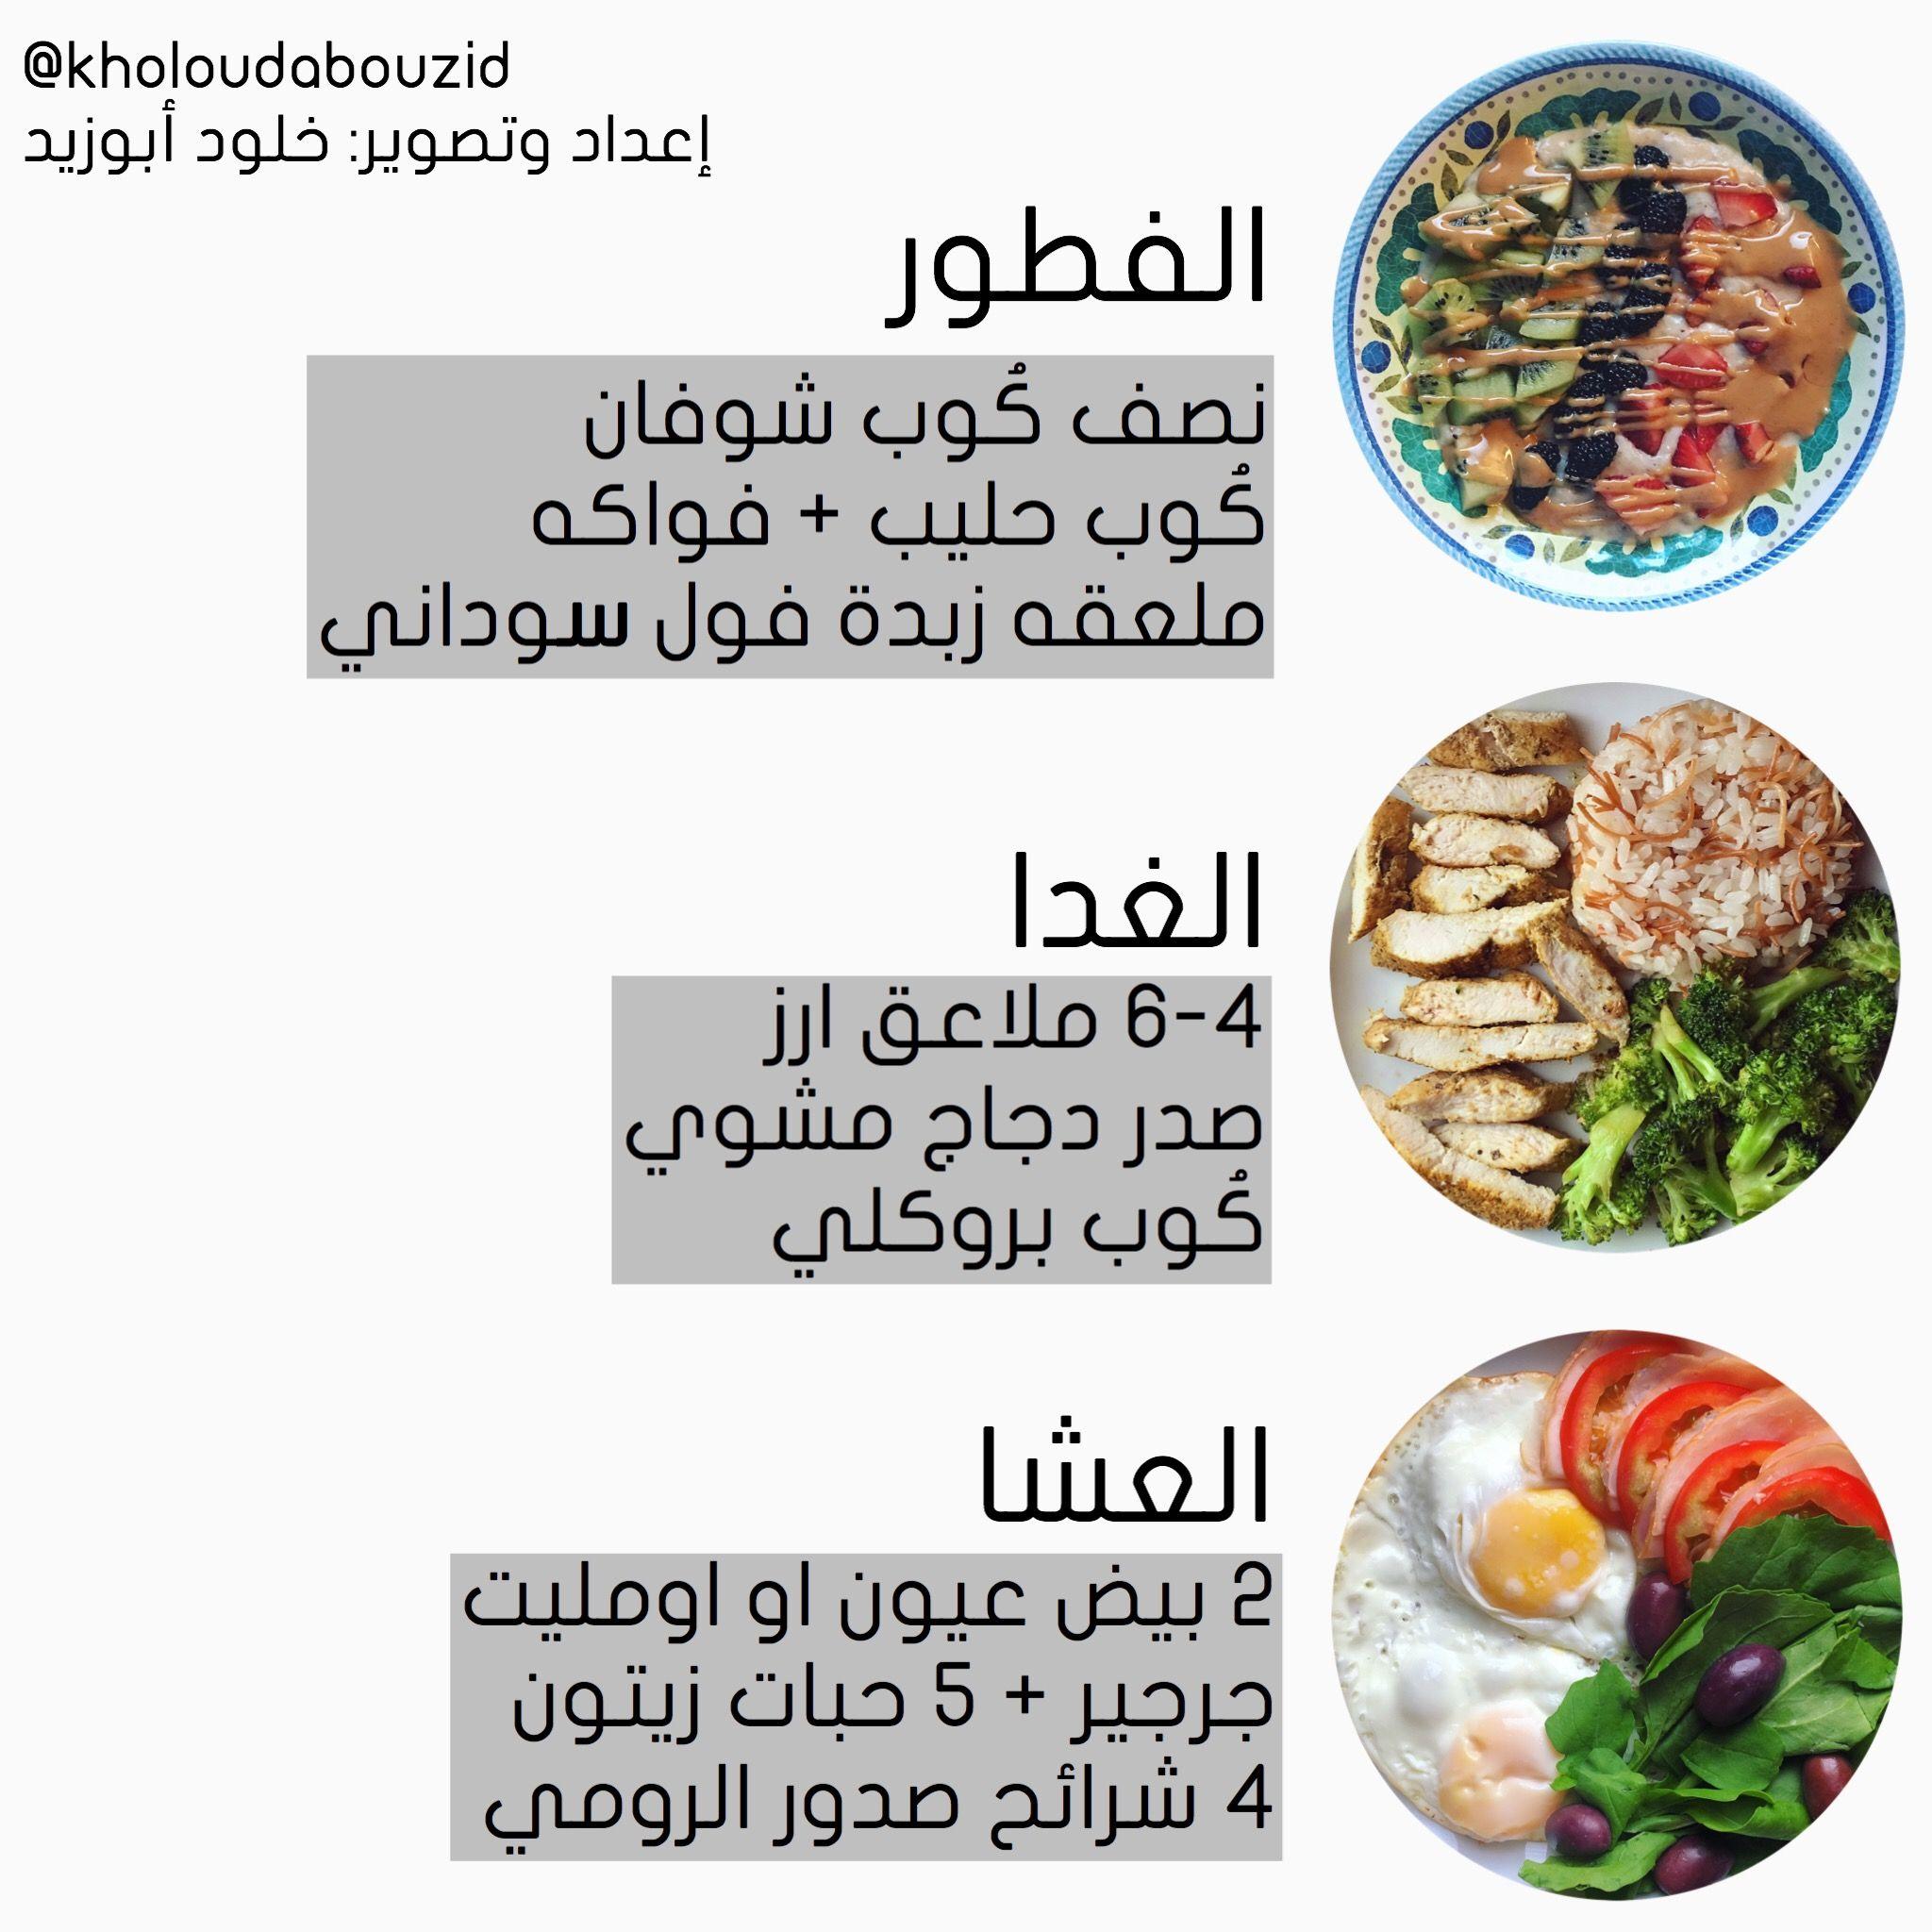 نظام دايت صحي ١٤٠٠ سعر حراري خلود ابوزيد Health Facts Food Health Fitness Food Health Food